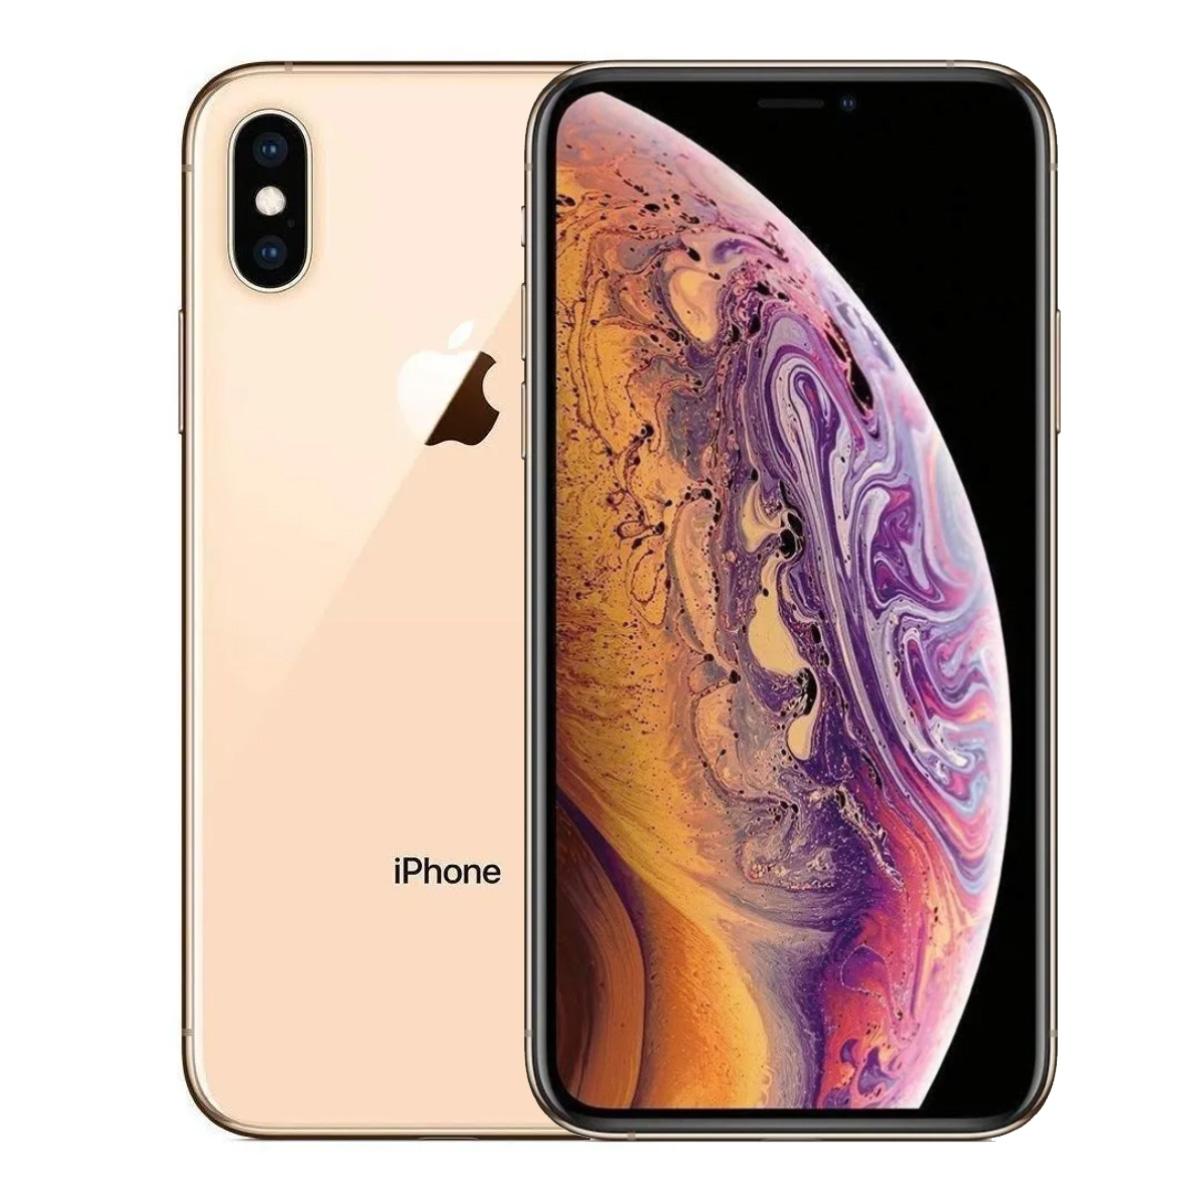 Apple iPhone Xs 64GB Tela 5.8' 12MP iOS 14 - Mostruário